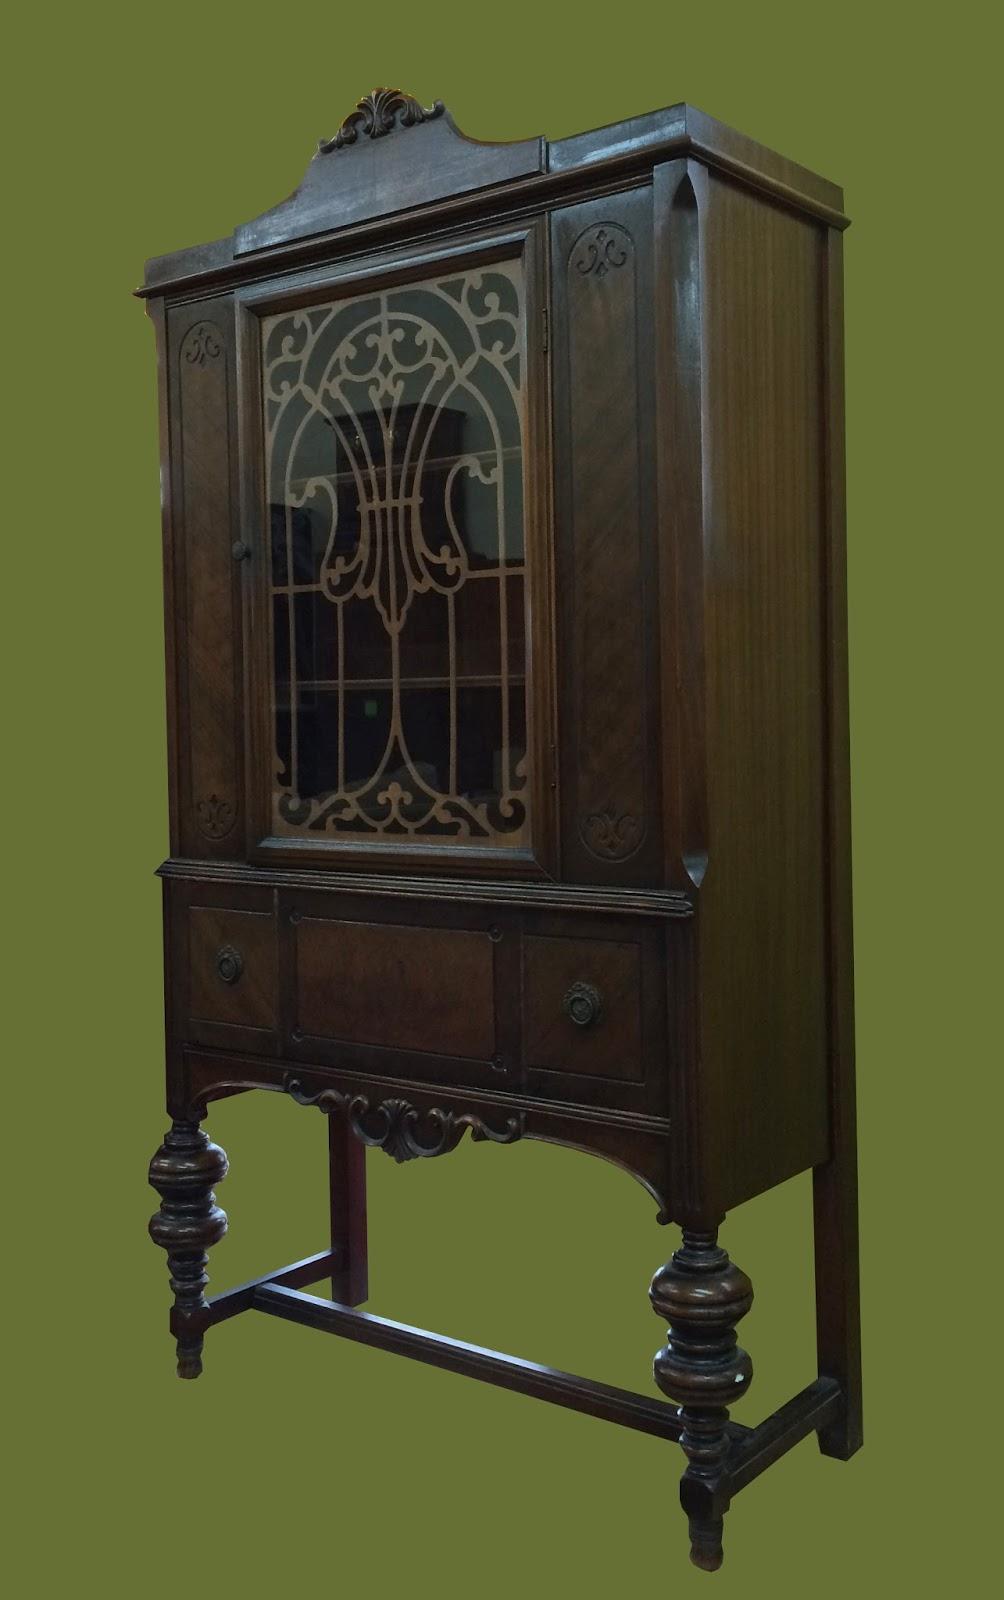 Vintage 1930s Walnut Dining Room Set 465 445 Sold